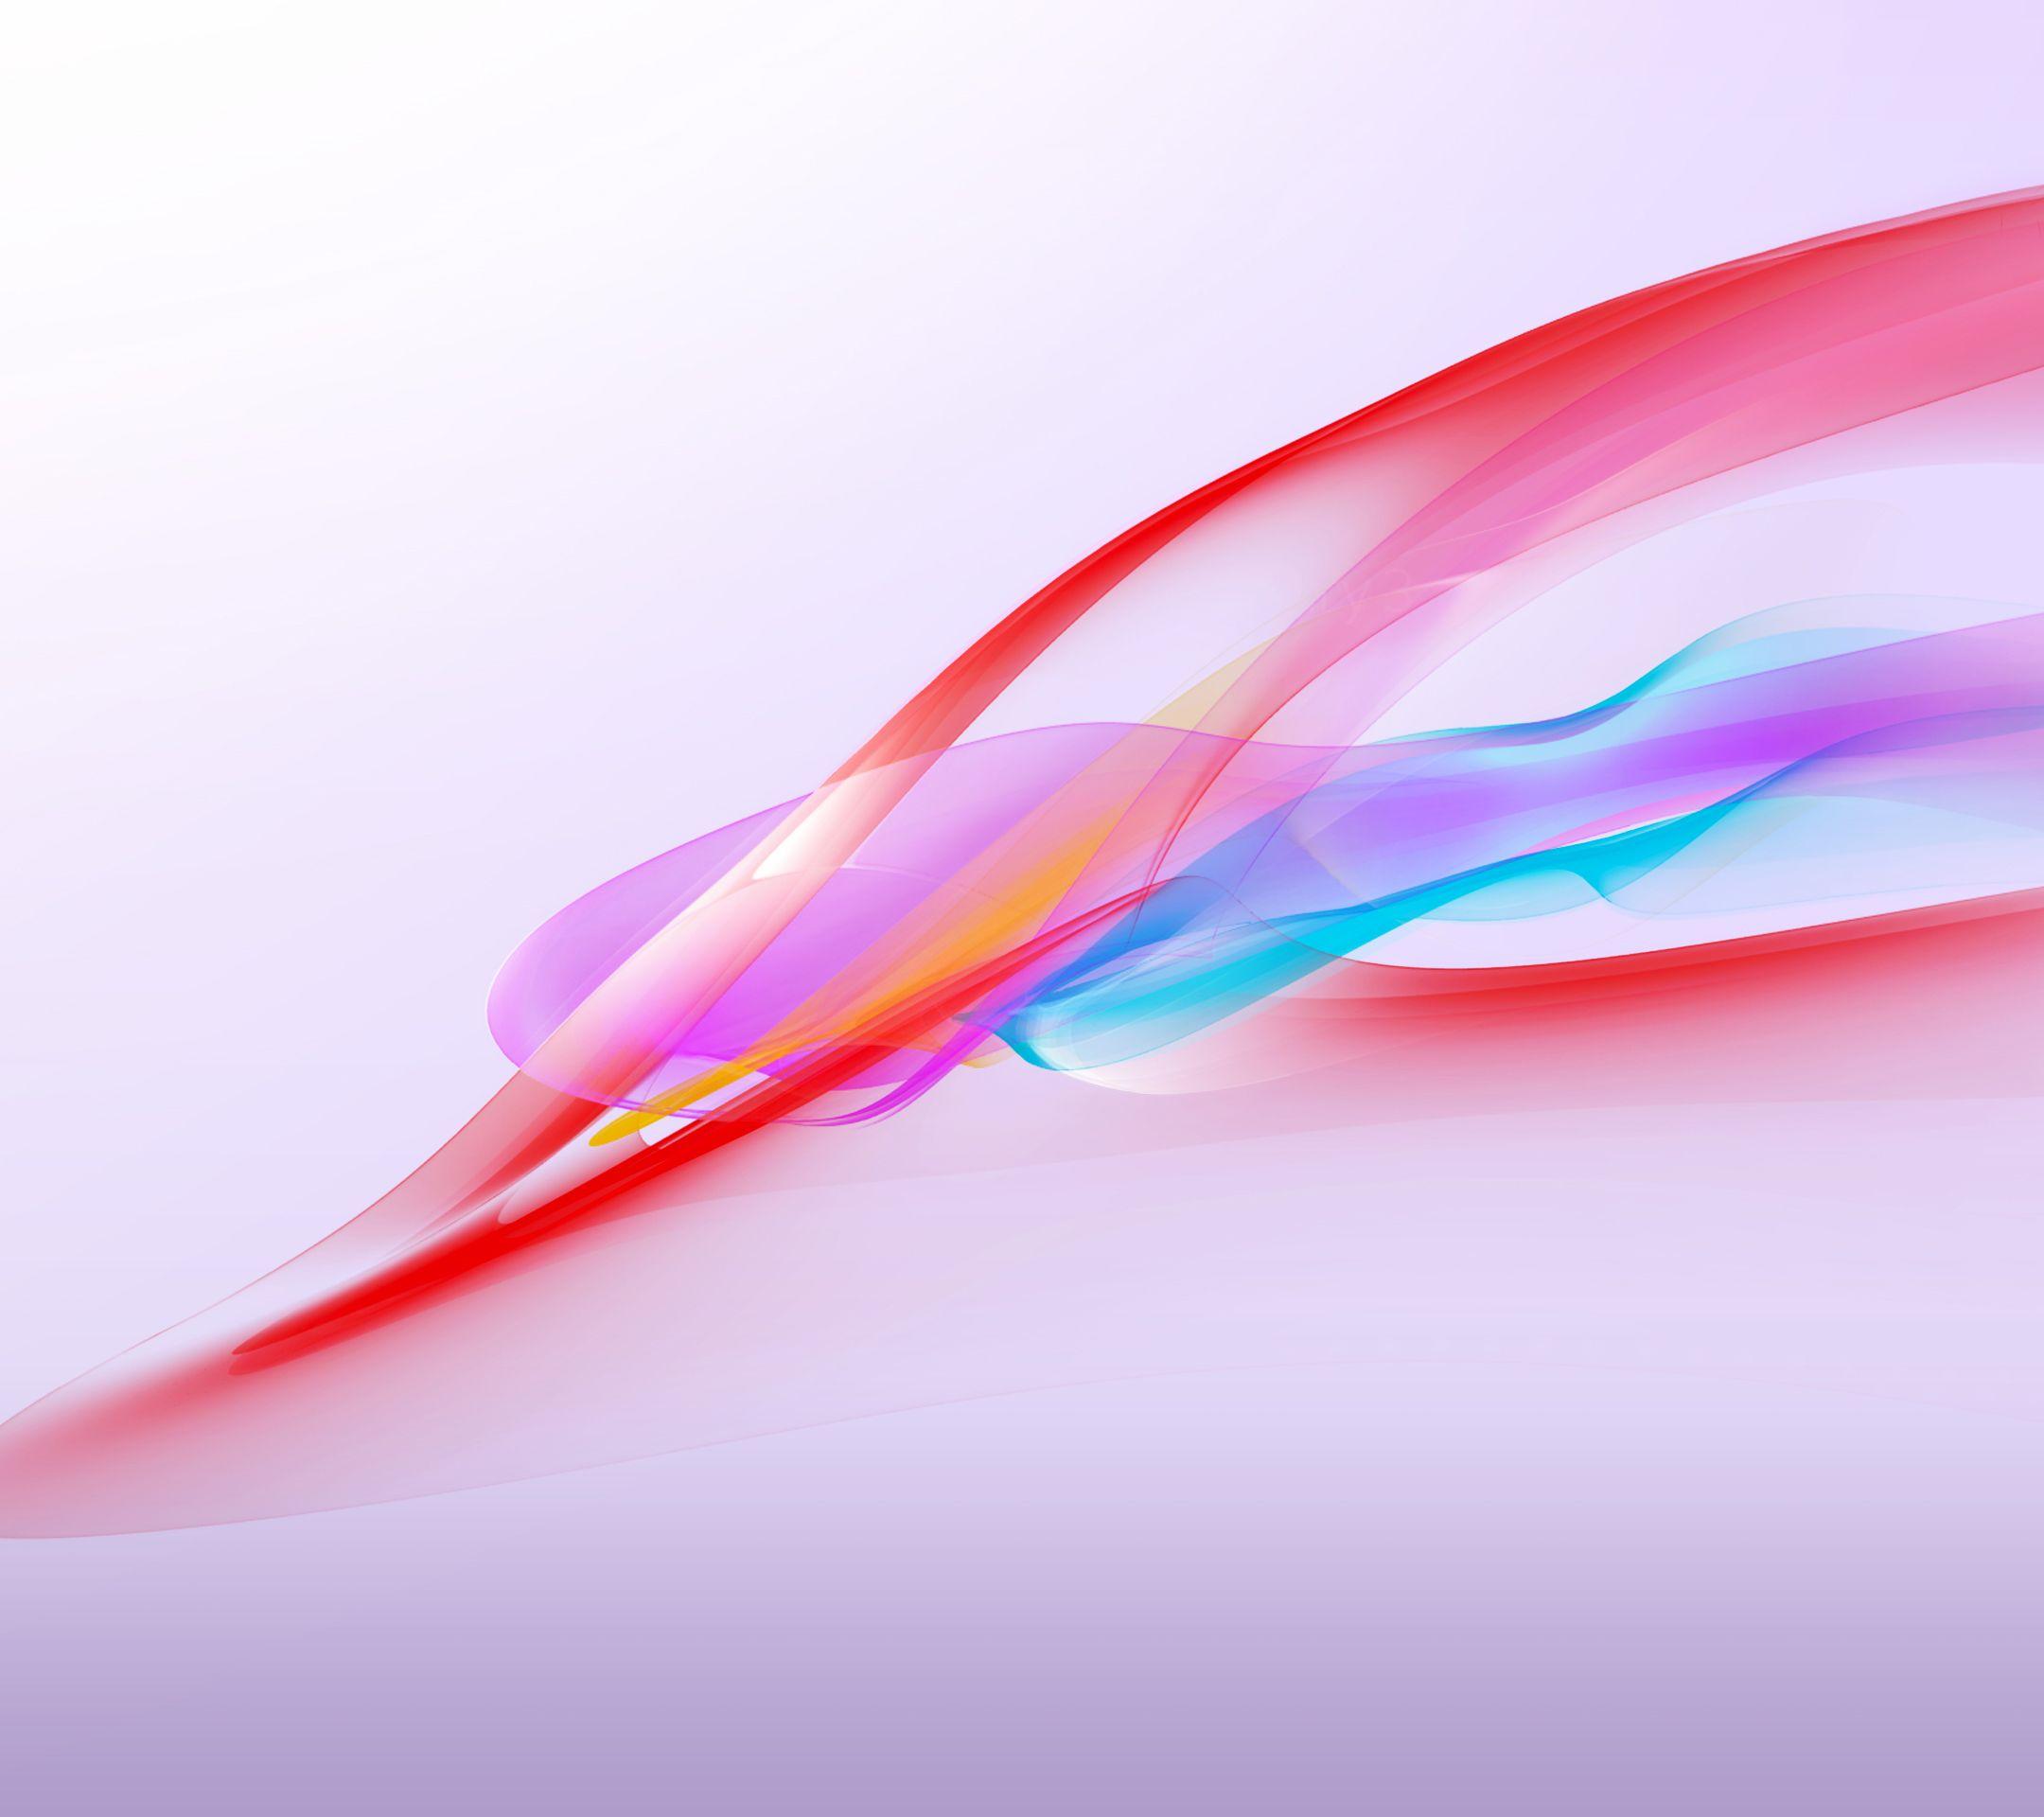 Mod Jb Xperia Z Ultra Themes 30 6 Sony Xperia Z 壁紙 最高の壁紙 Xperia 壁紙